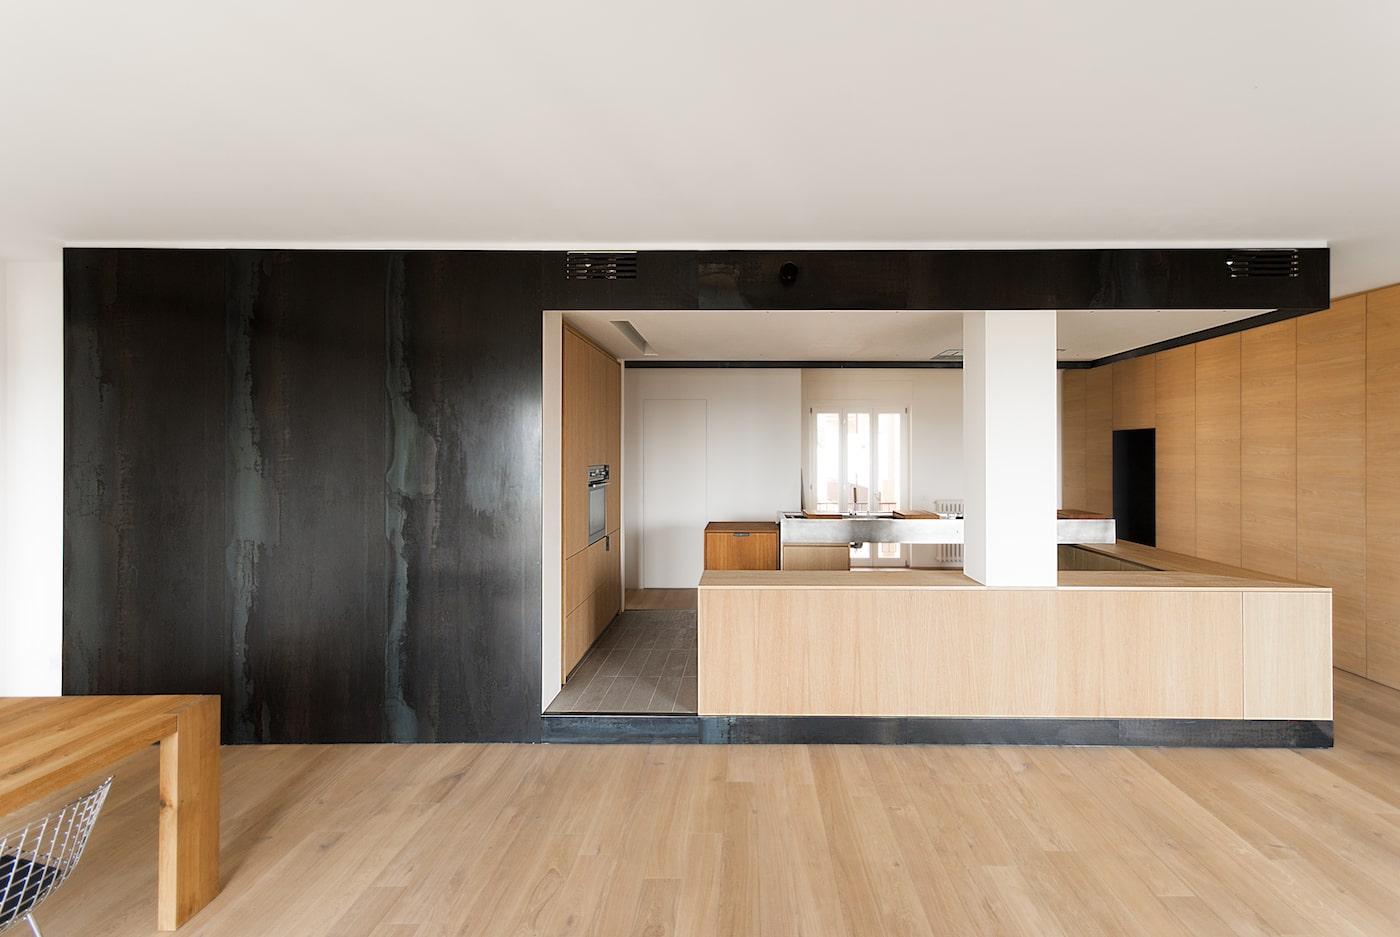 LCA Wood & Iron apartment